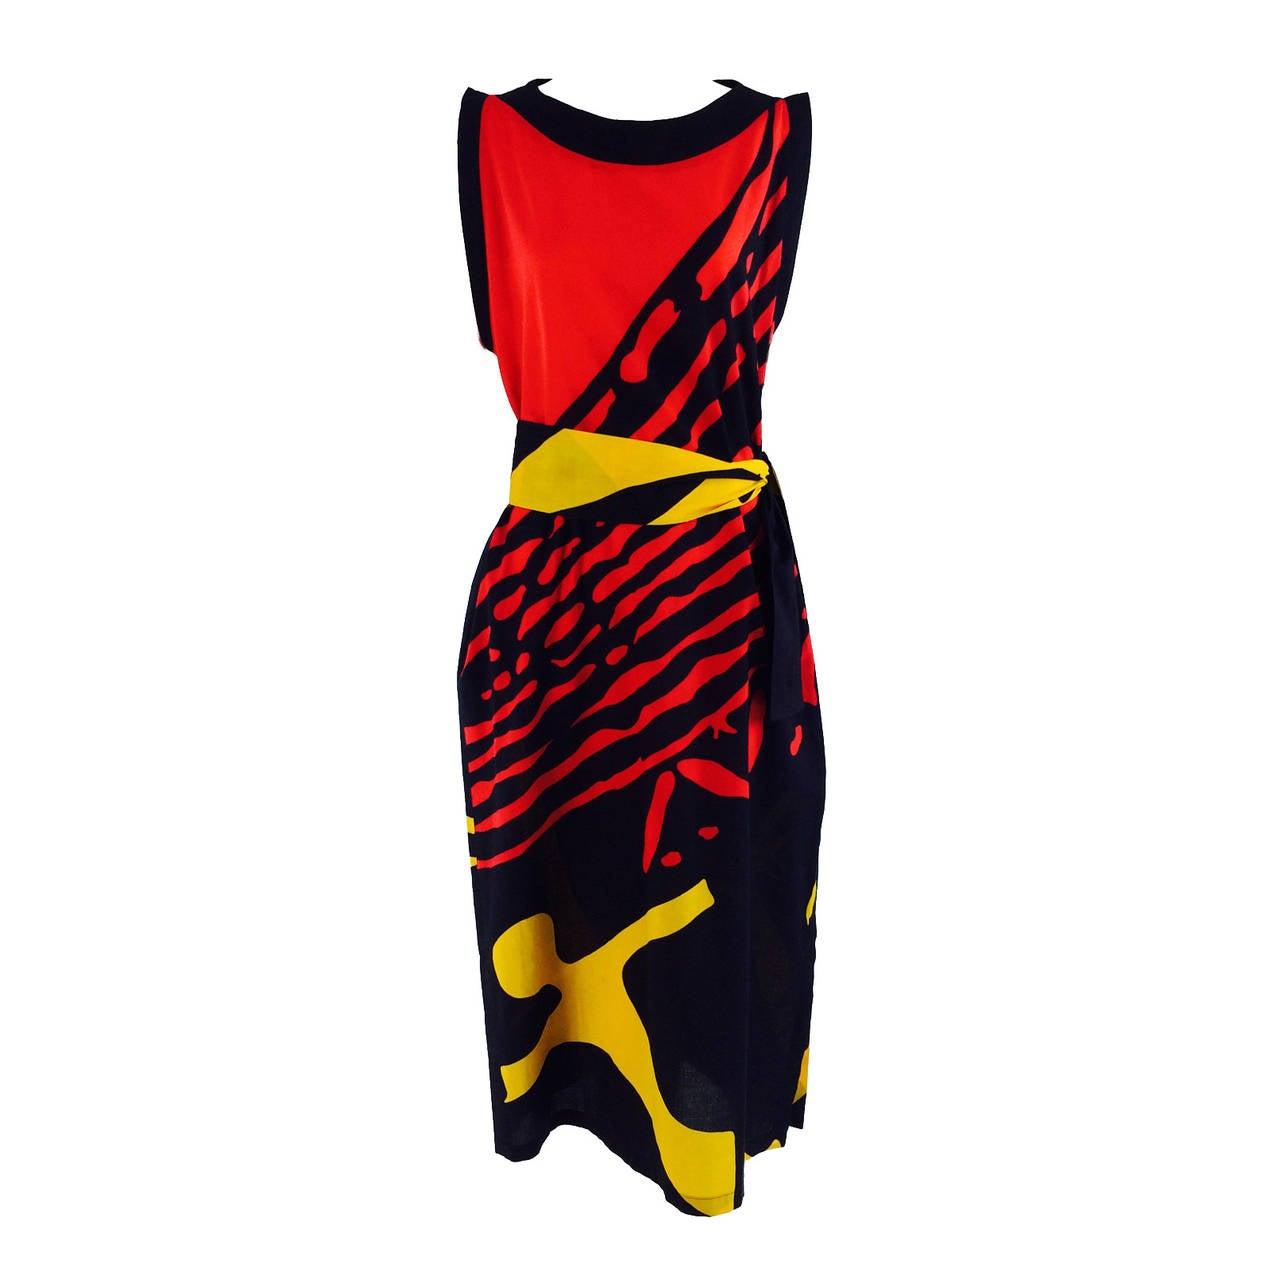 1980s Montenapoleone by Armonia Italy fine cotton shift dress 1